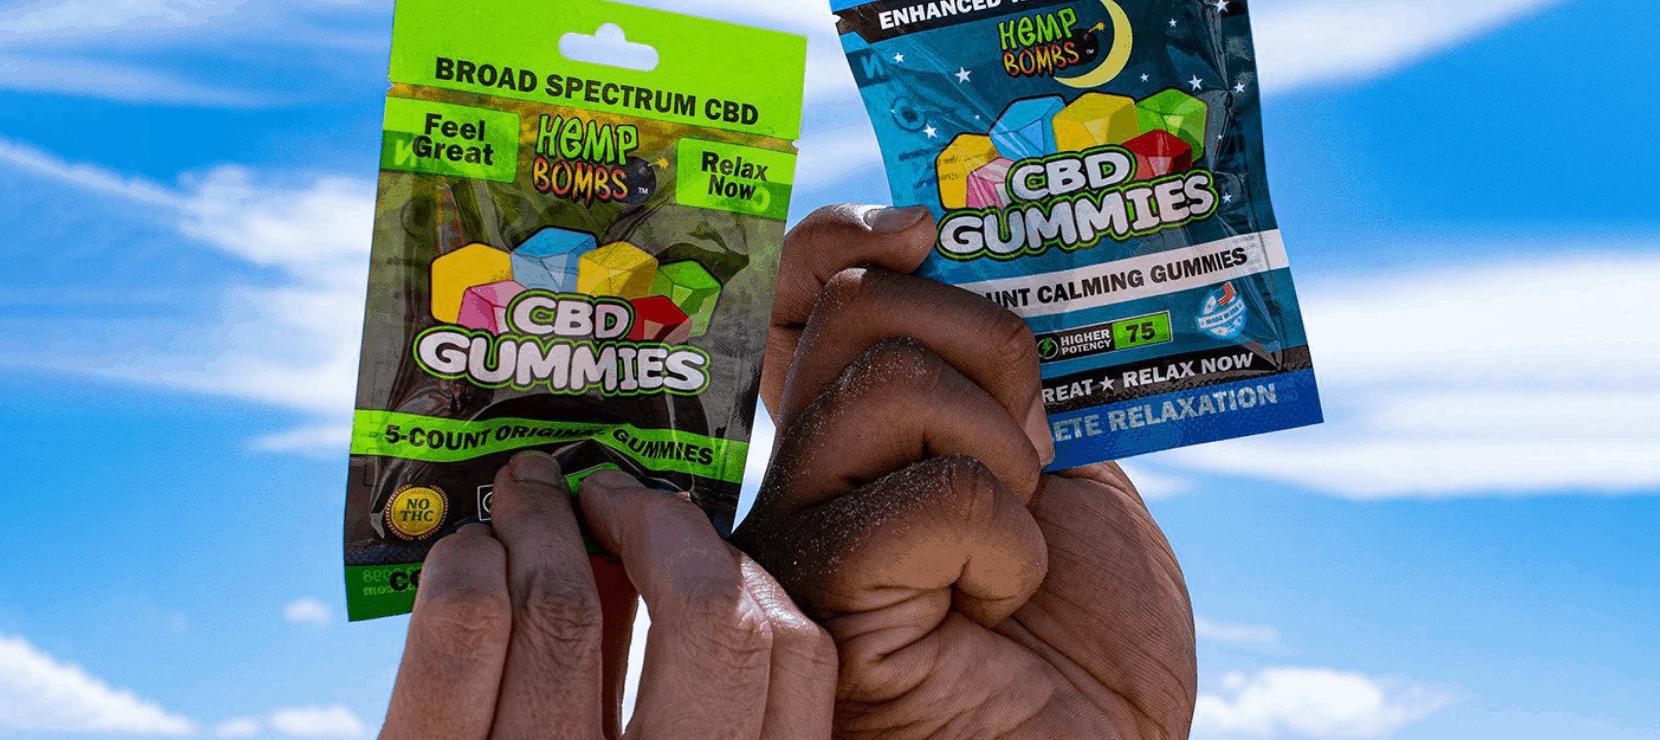 The CBD Site Coupon Code Gummies